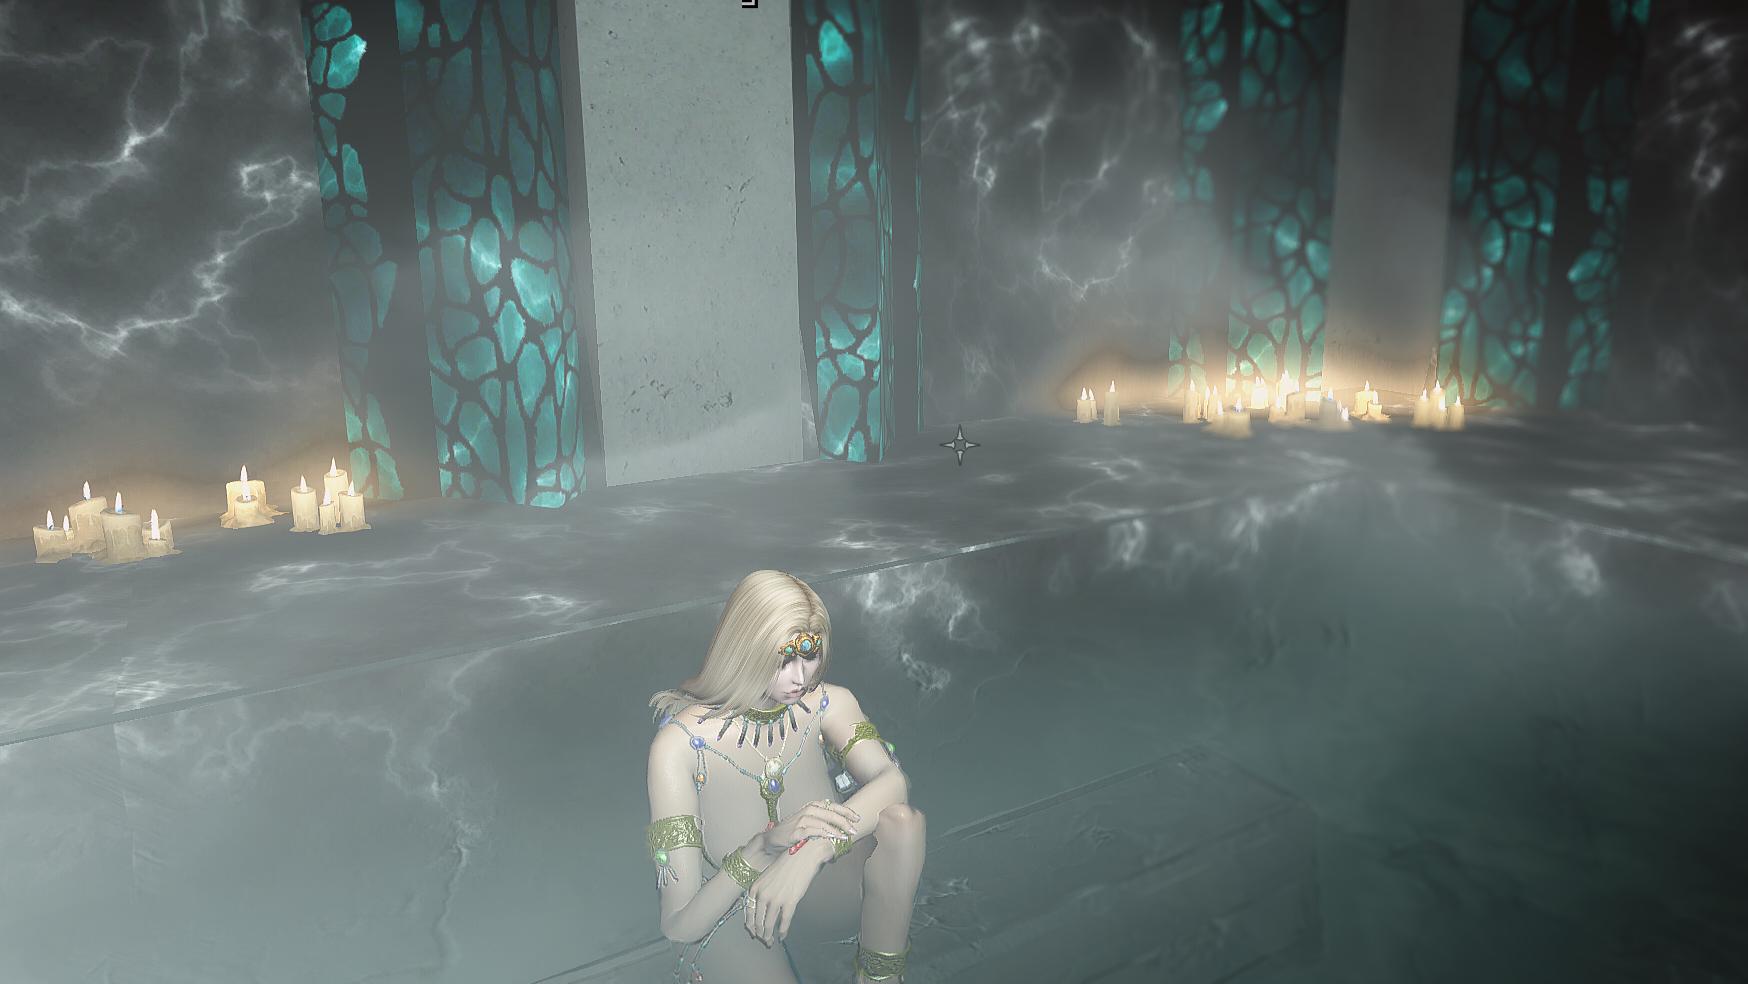 Tes V - Skyrim Screenshot 2018.06.13 - 18.34.42.56.png - Elder Scrolls 5: Skyrim, the